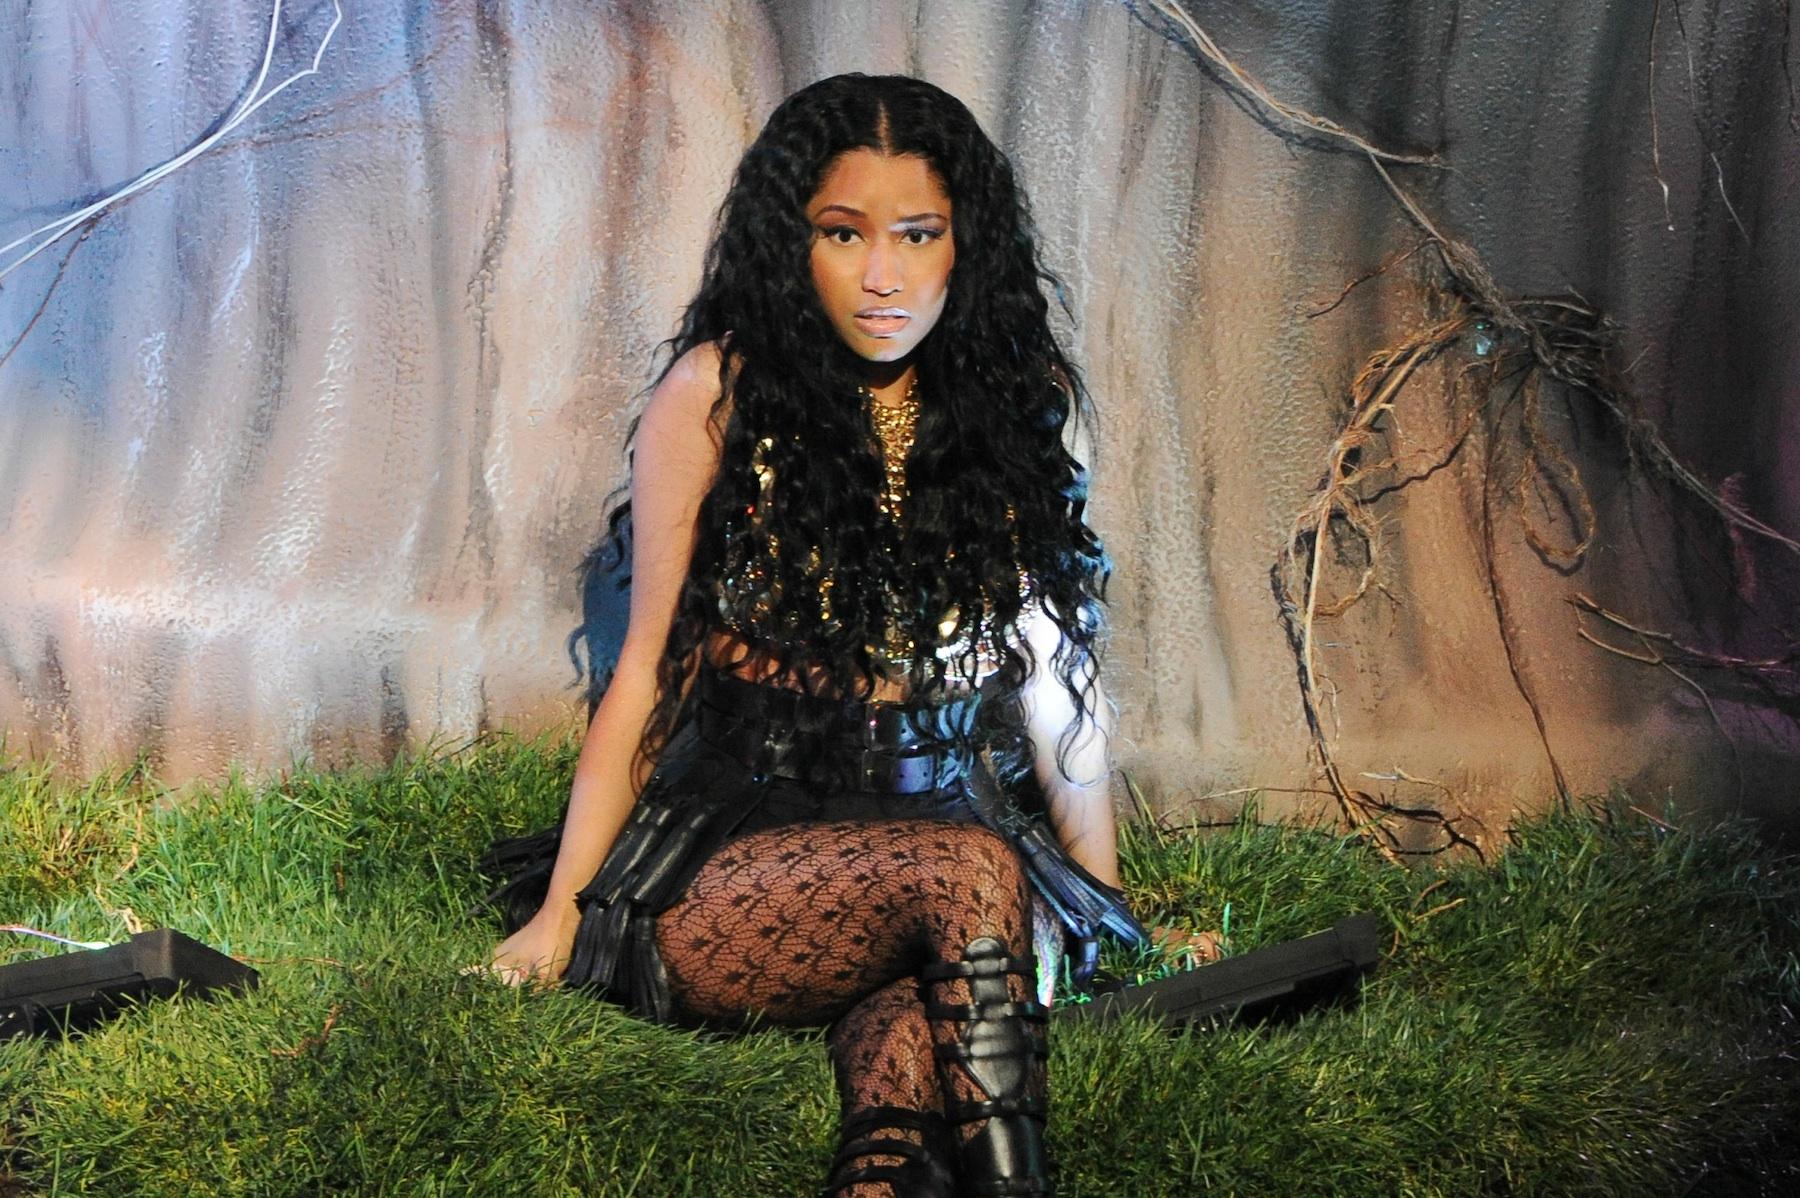 Nicki Minaj Dancer Bitten by a Giant Snake During VMA Rehearsal